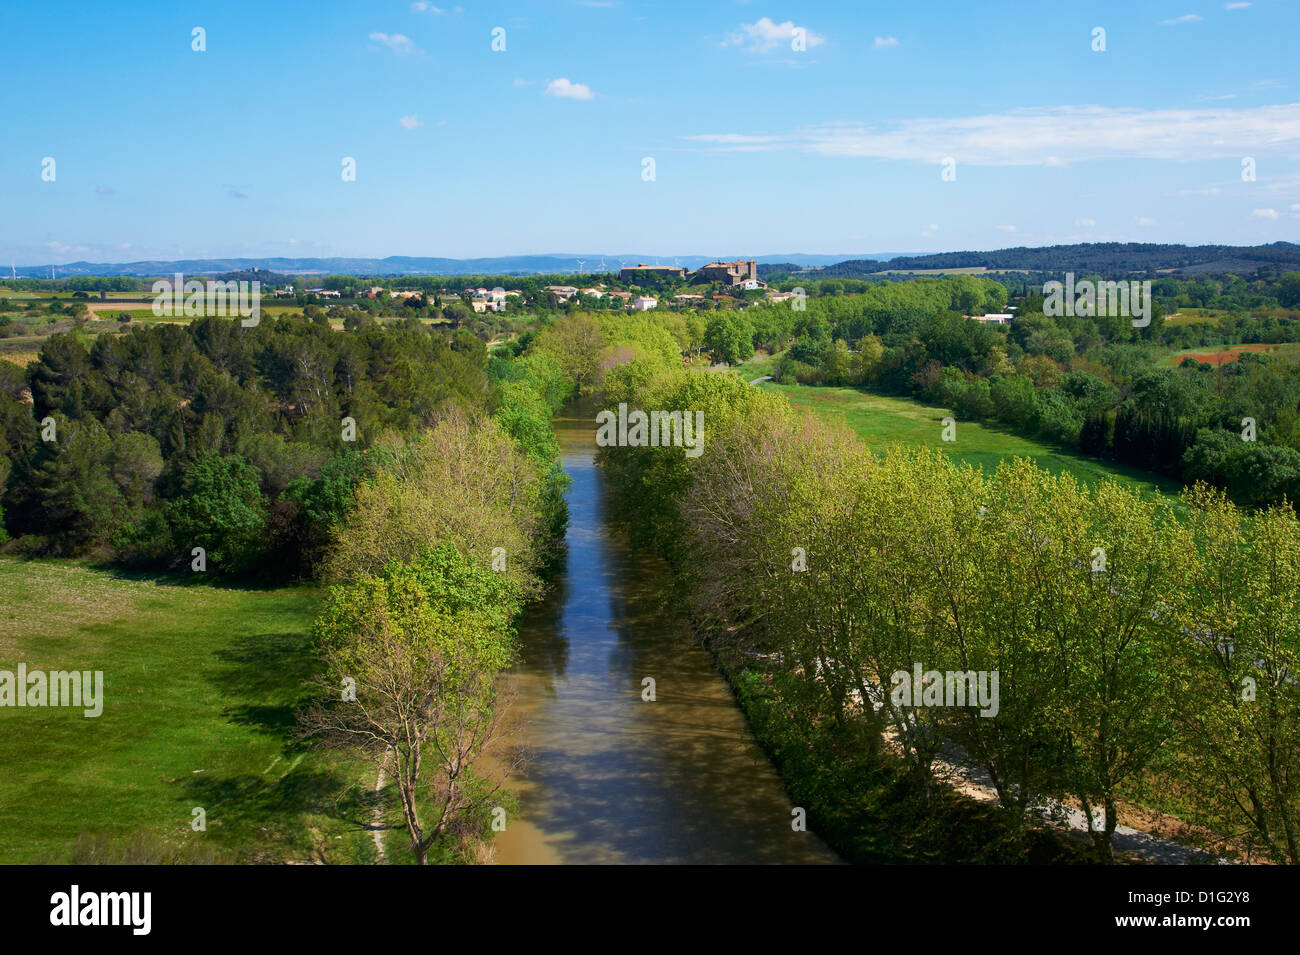 Argens Minervois village, Navigation on the Canal du Midi, Aude, Languedoc Roussillon, France, Europe - Stock Image